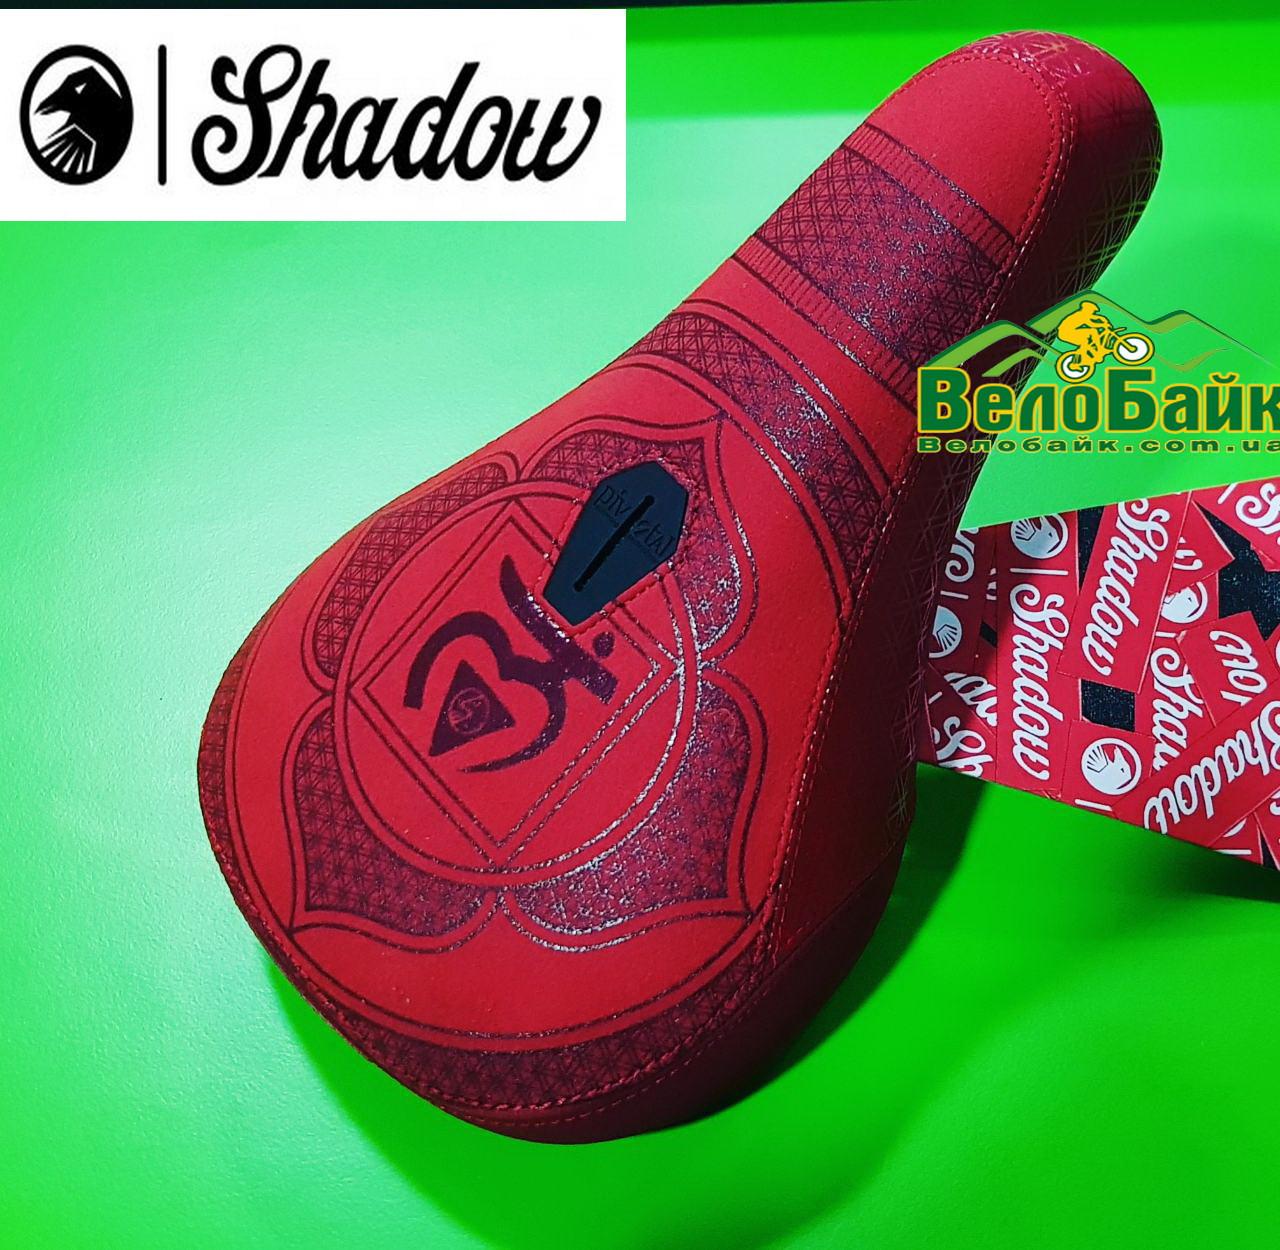 Седло SHADOW TSC Penumbra Pivotal Mid seat Coulomb Series 6 красное